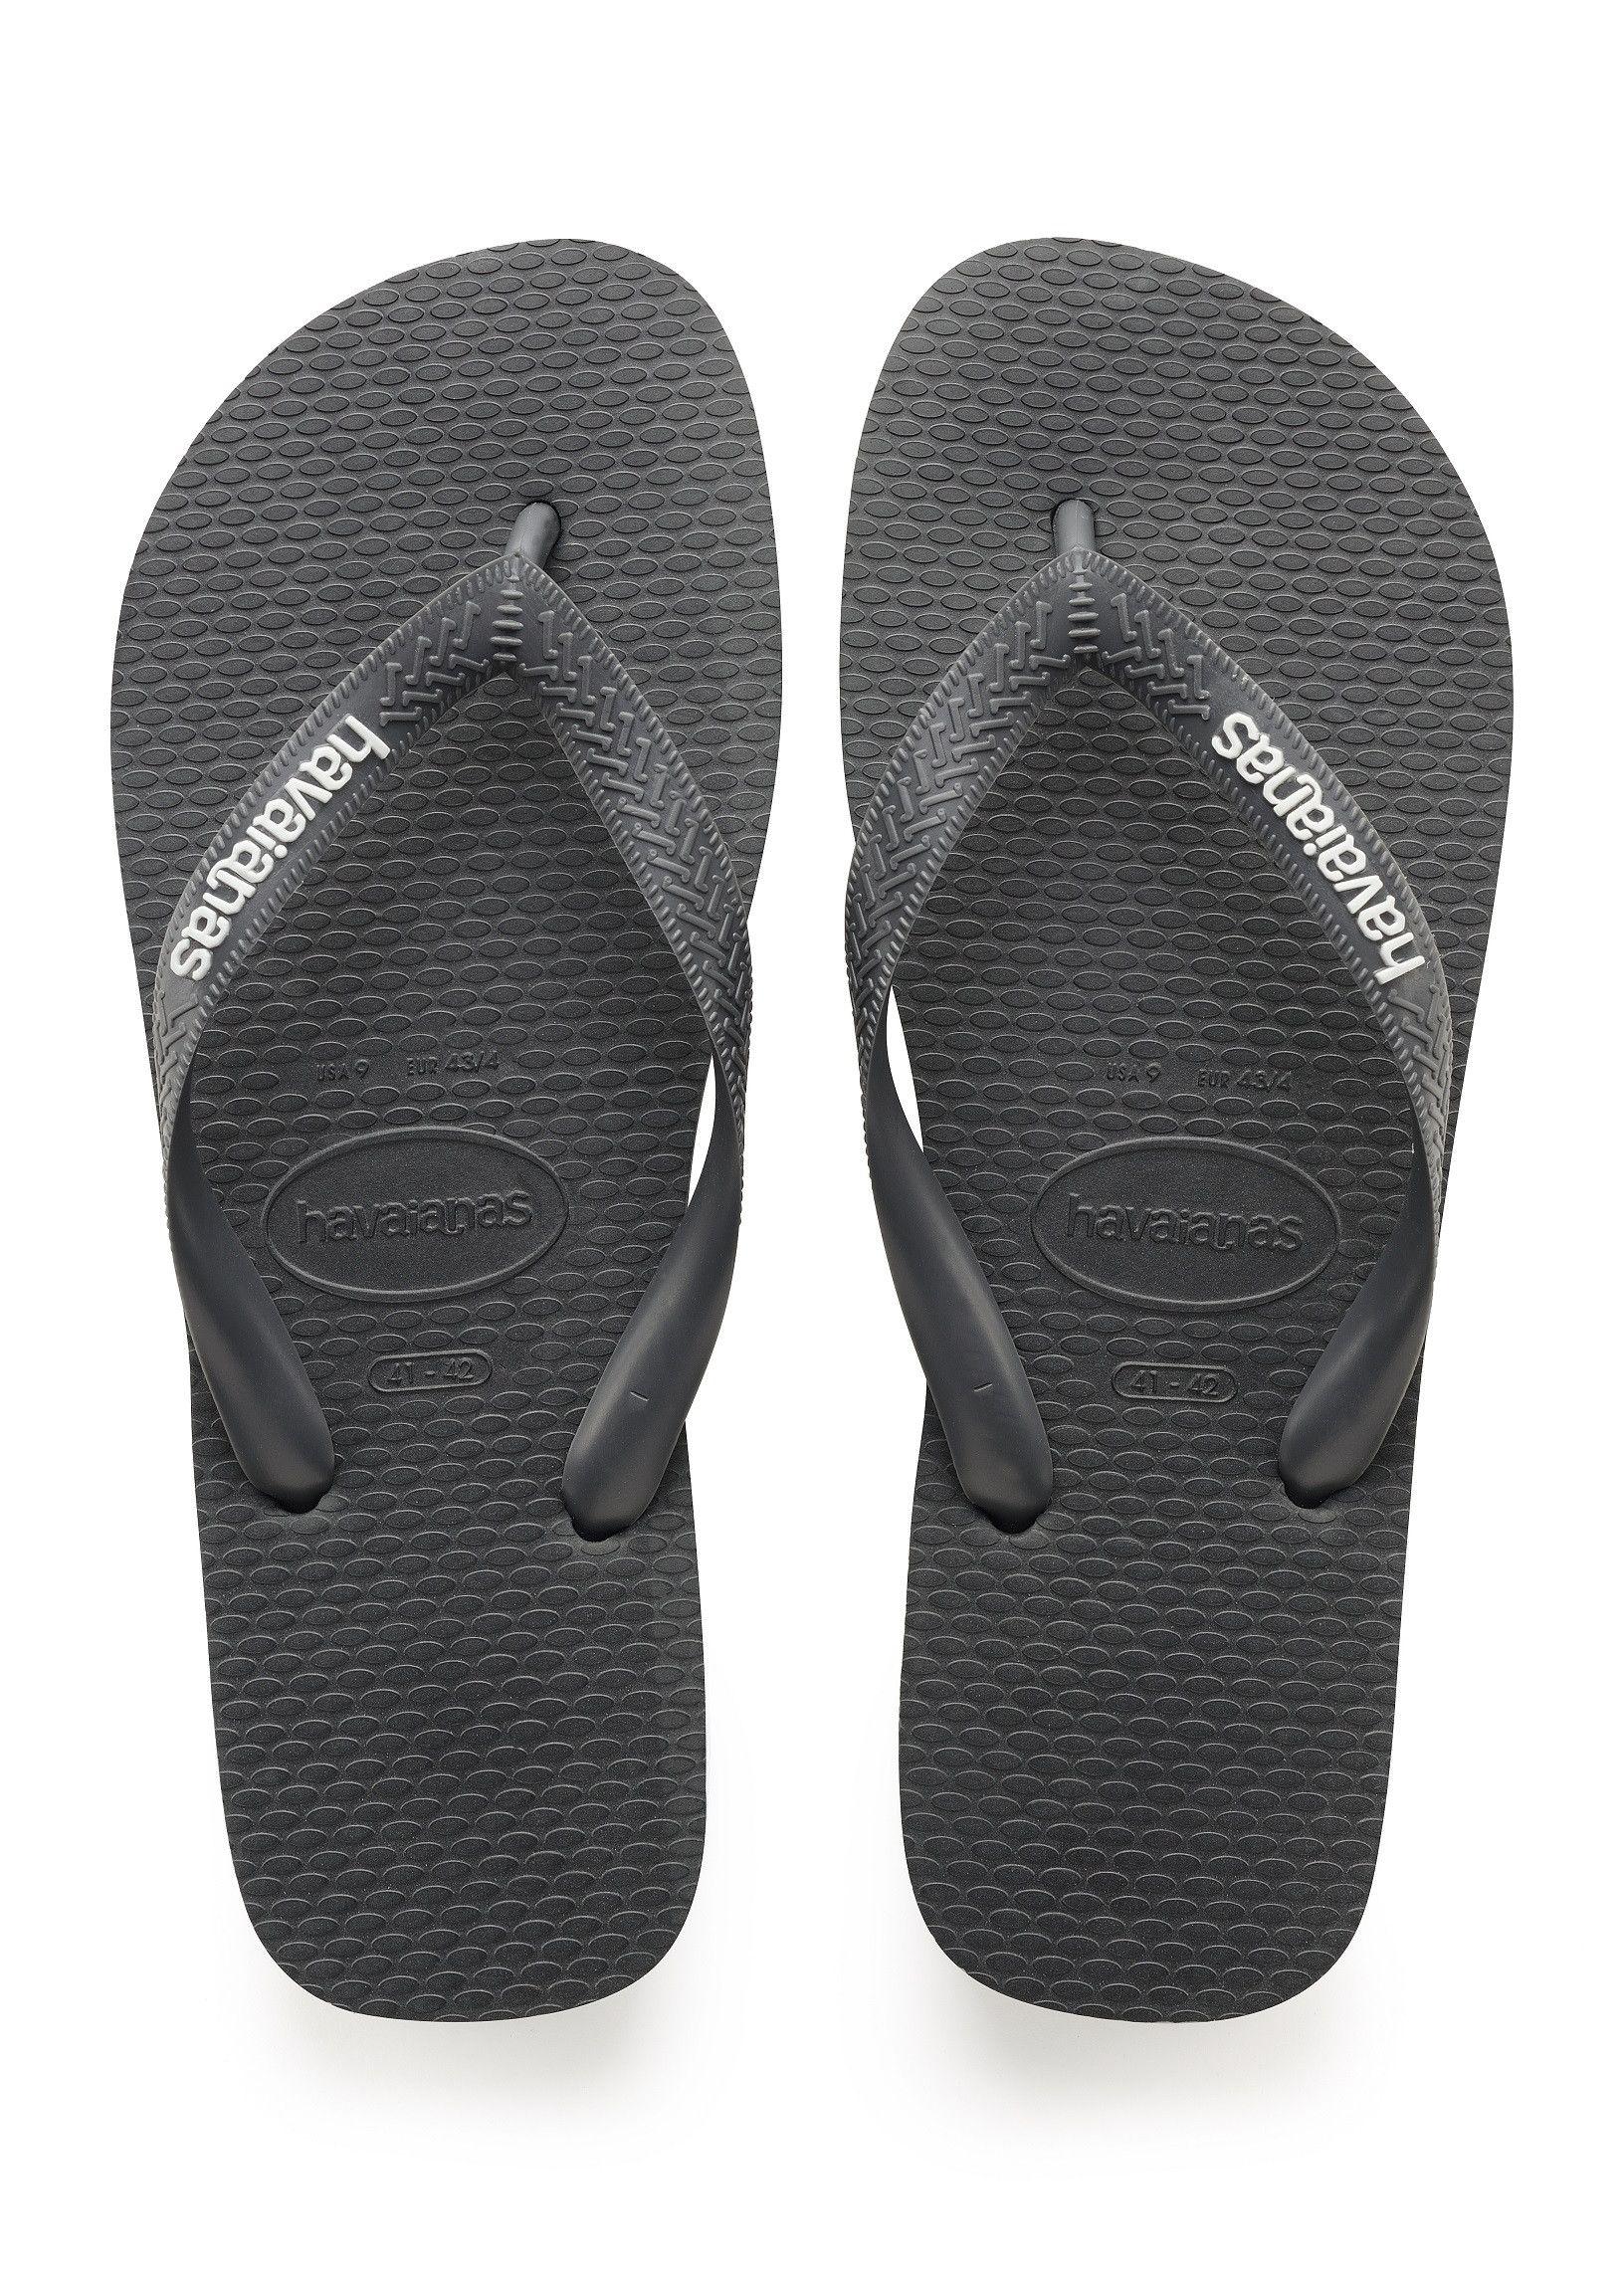 Havaianas Hav Top Unisex Black Gold Rubber Sandal